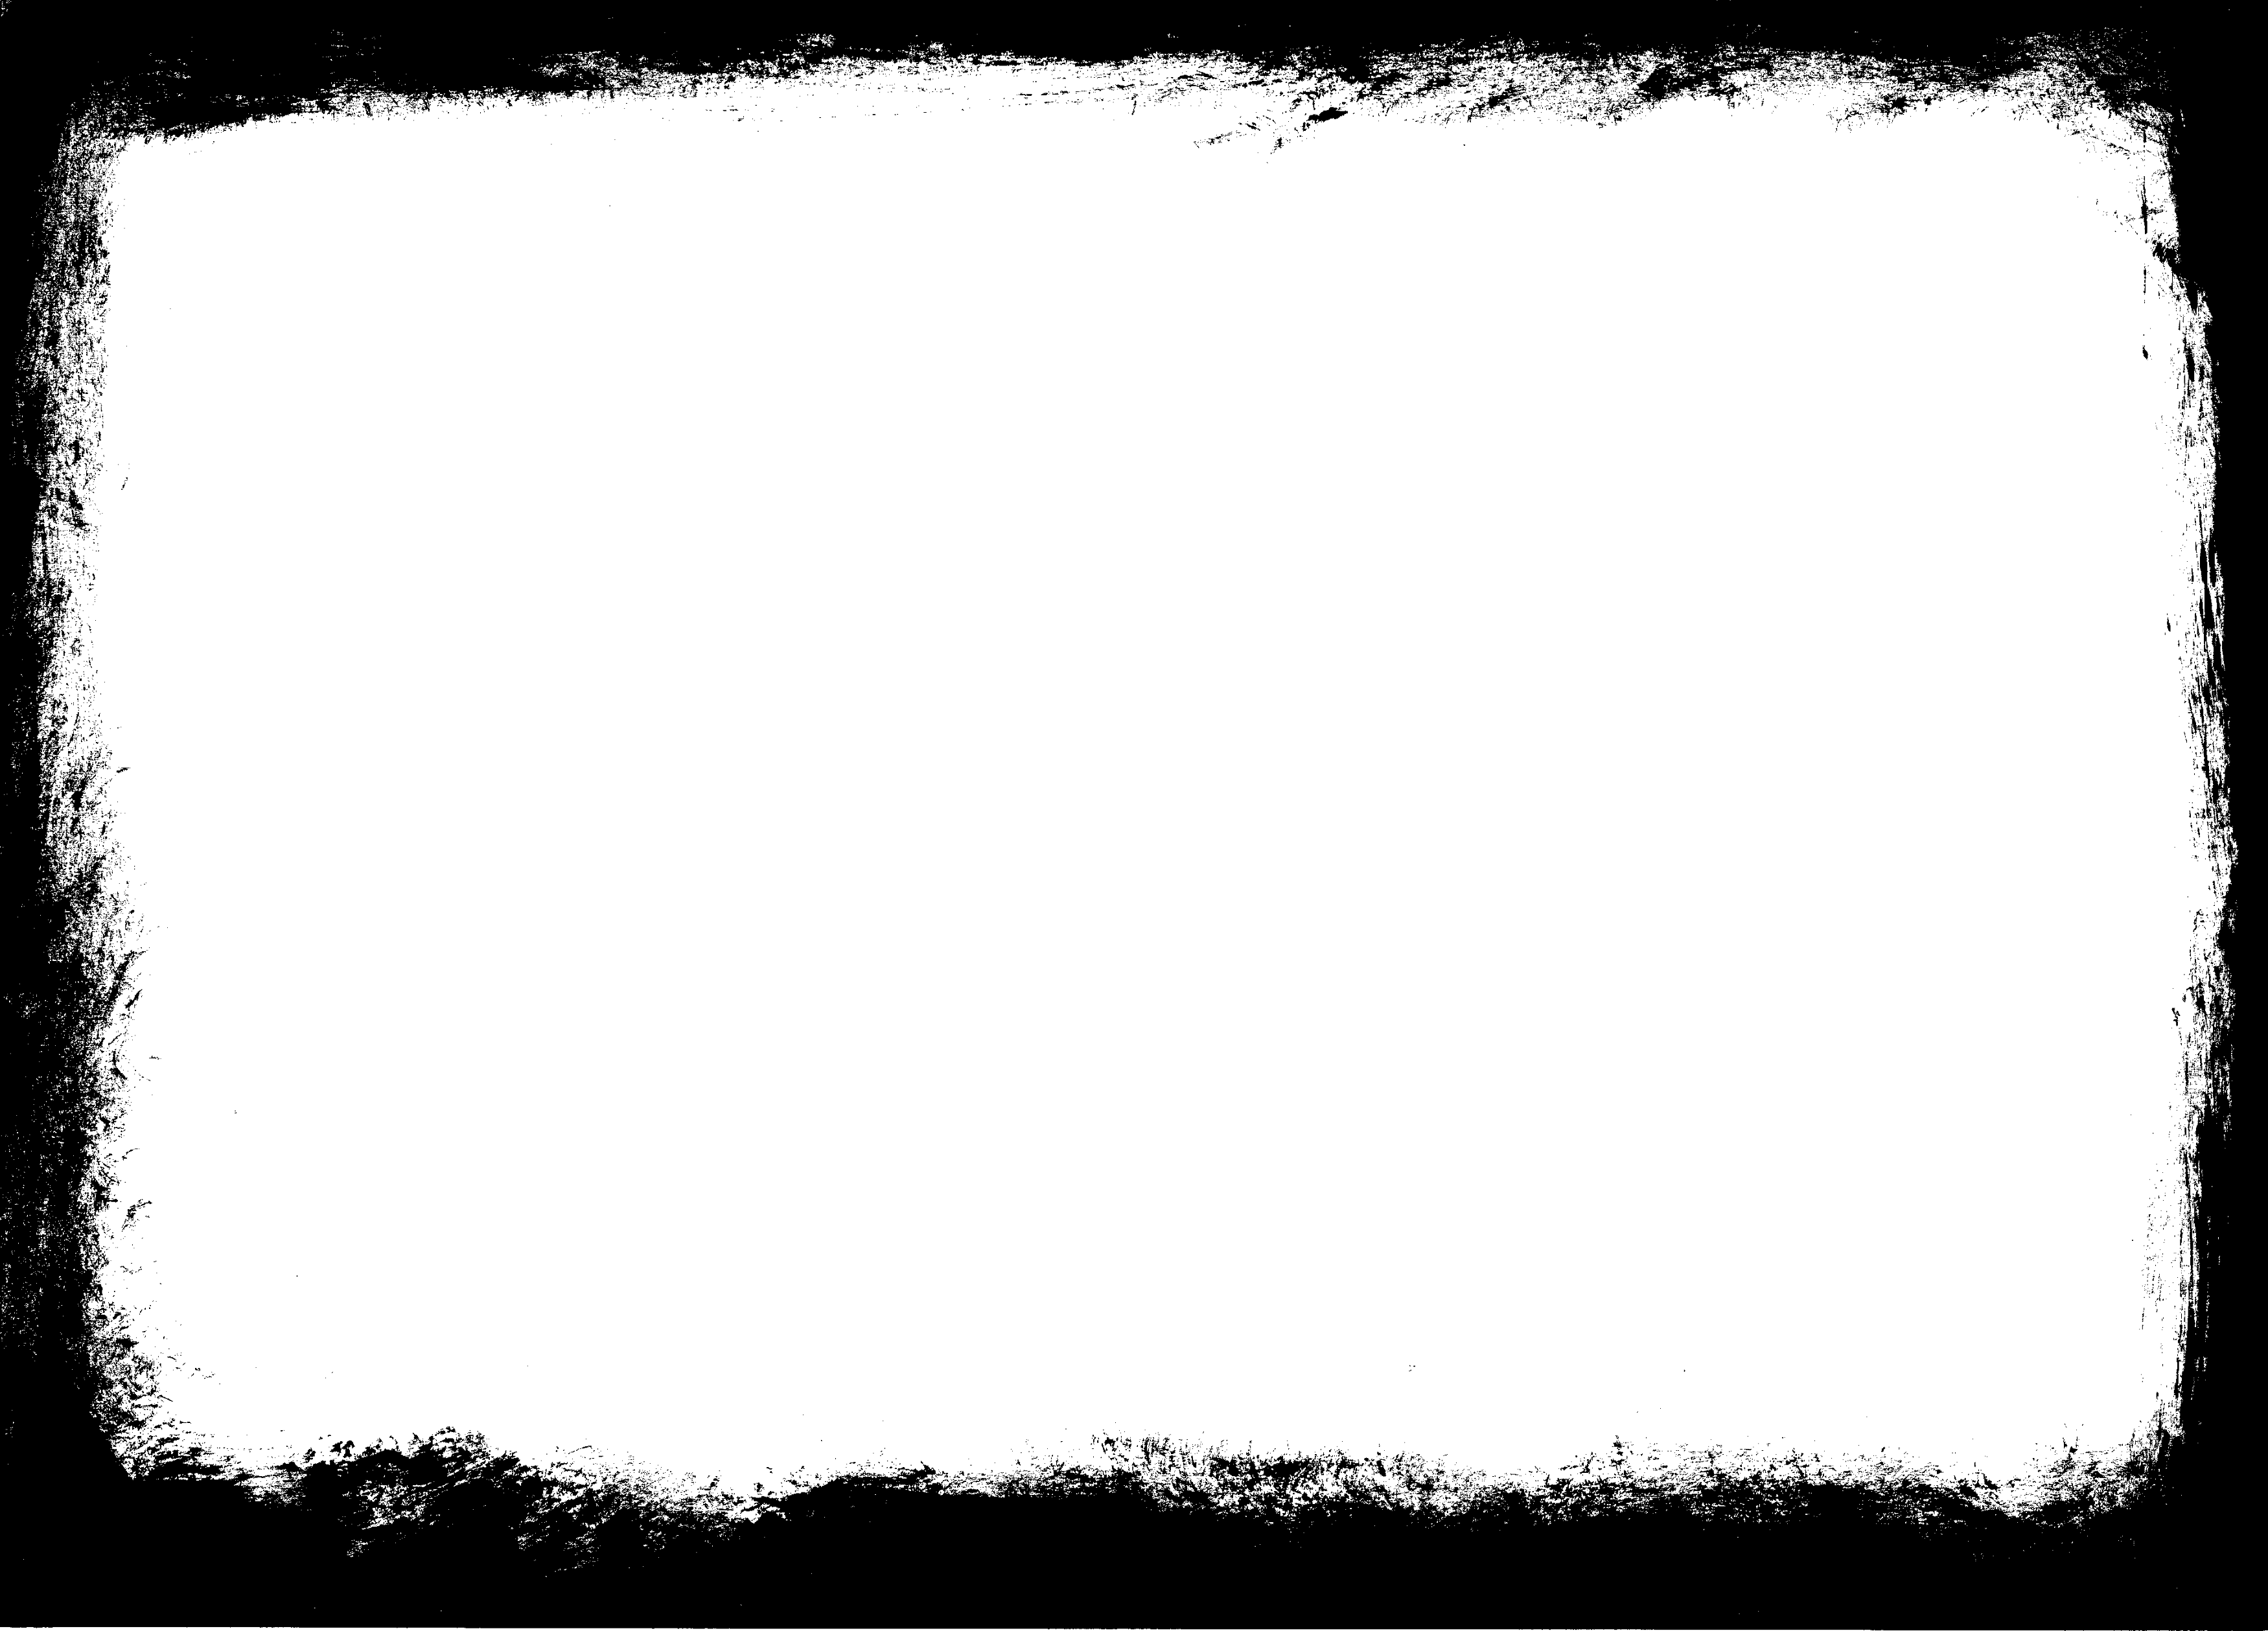 8 Grunge Frame (PNG) Vol. 2 | OnlyGFX.com